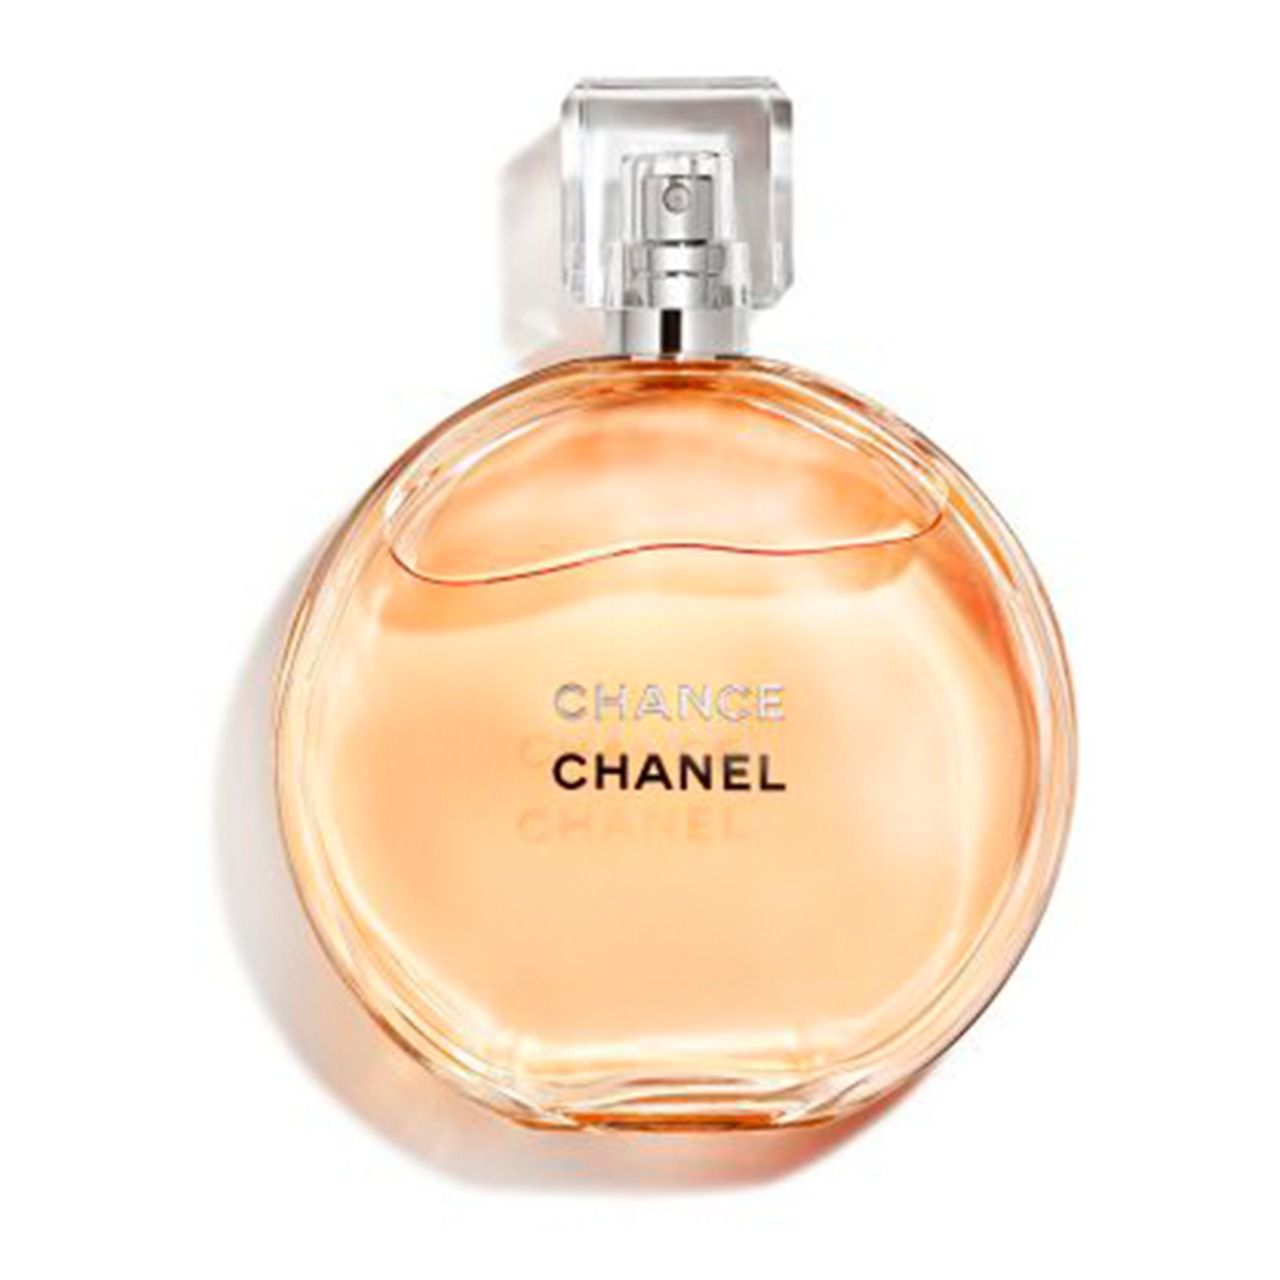 Chance Chanel Eau de Toilette Chanel Feminino